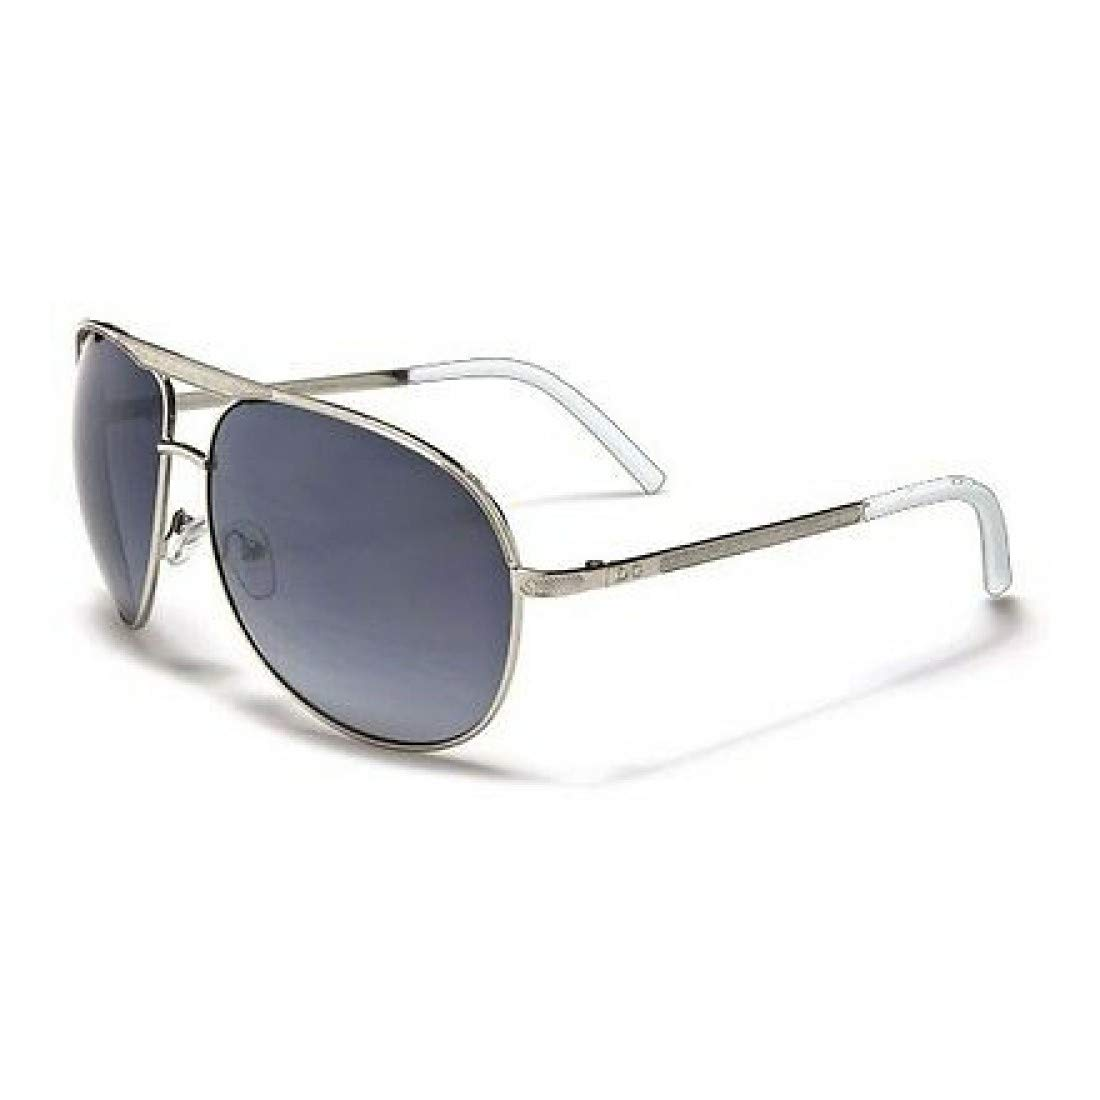 Double Bridge Classic Metal Frame Men Women Driving Aviator Sunglasses